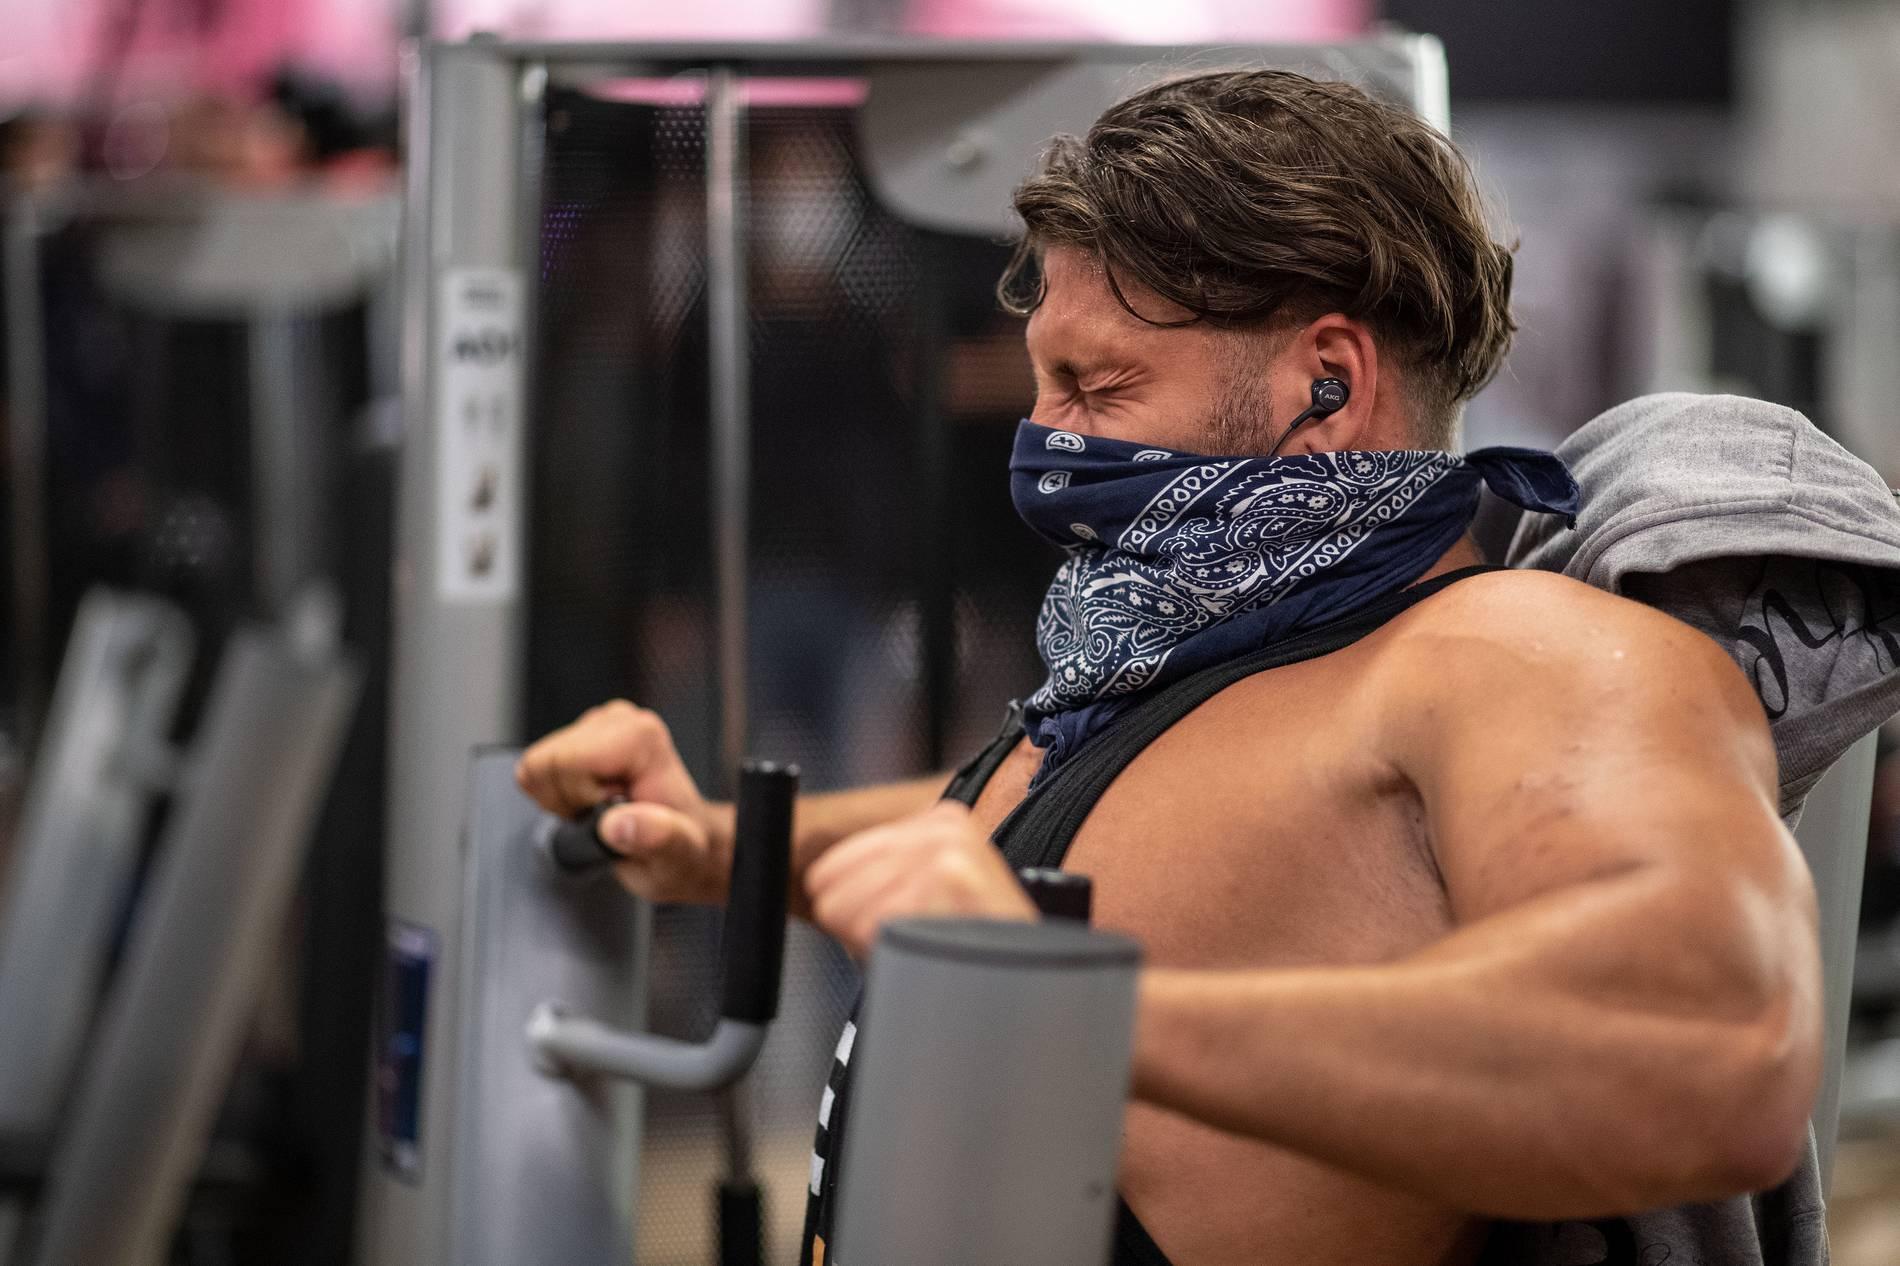 Fitnessstudios In Bonn Offnen Nach Corona Pause Wieder